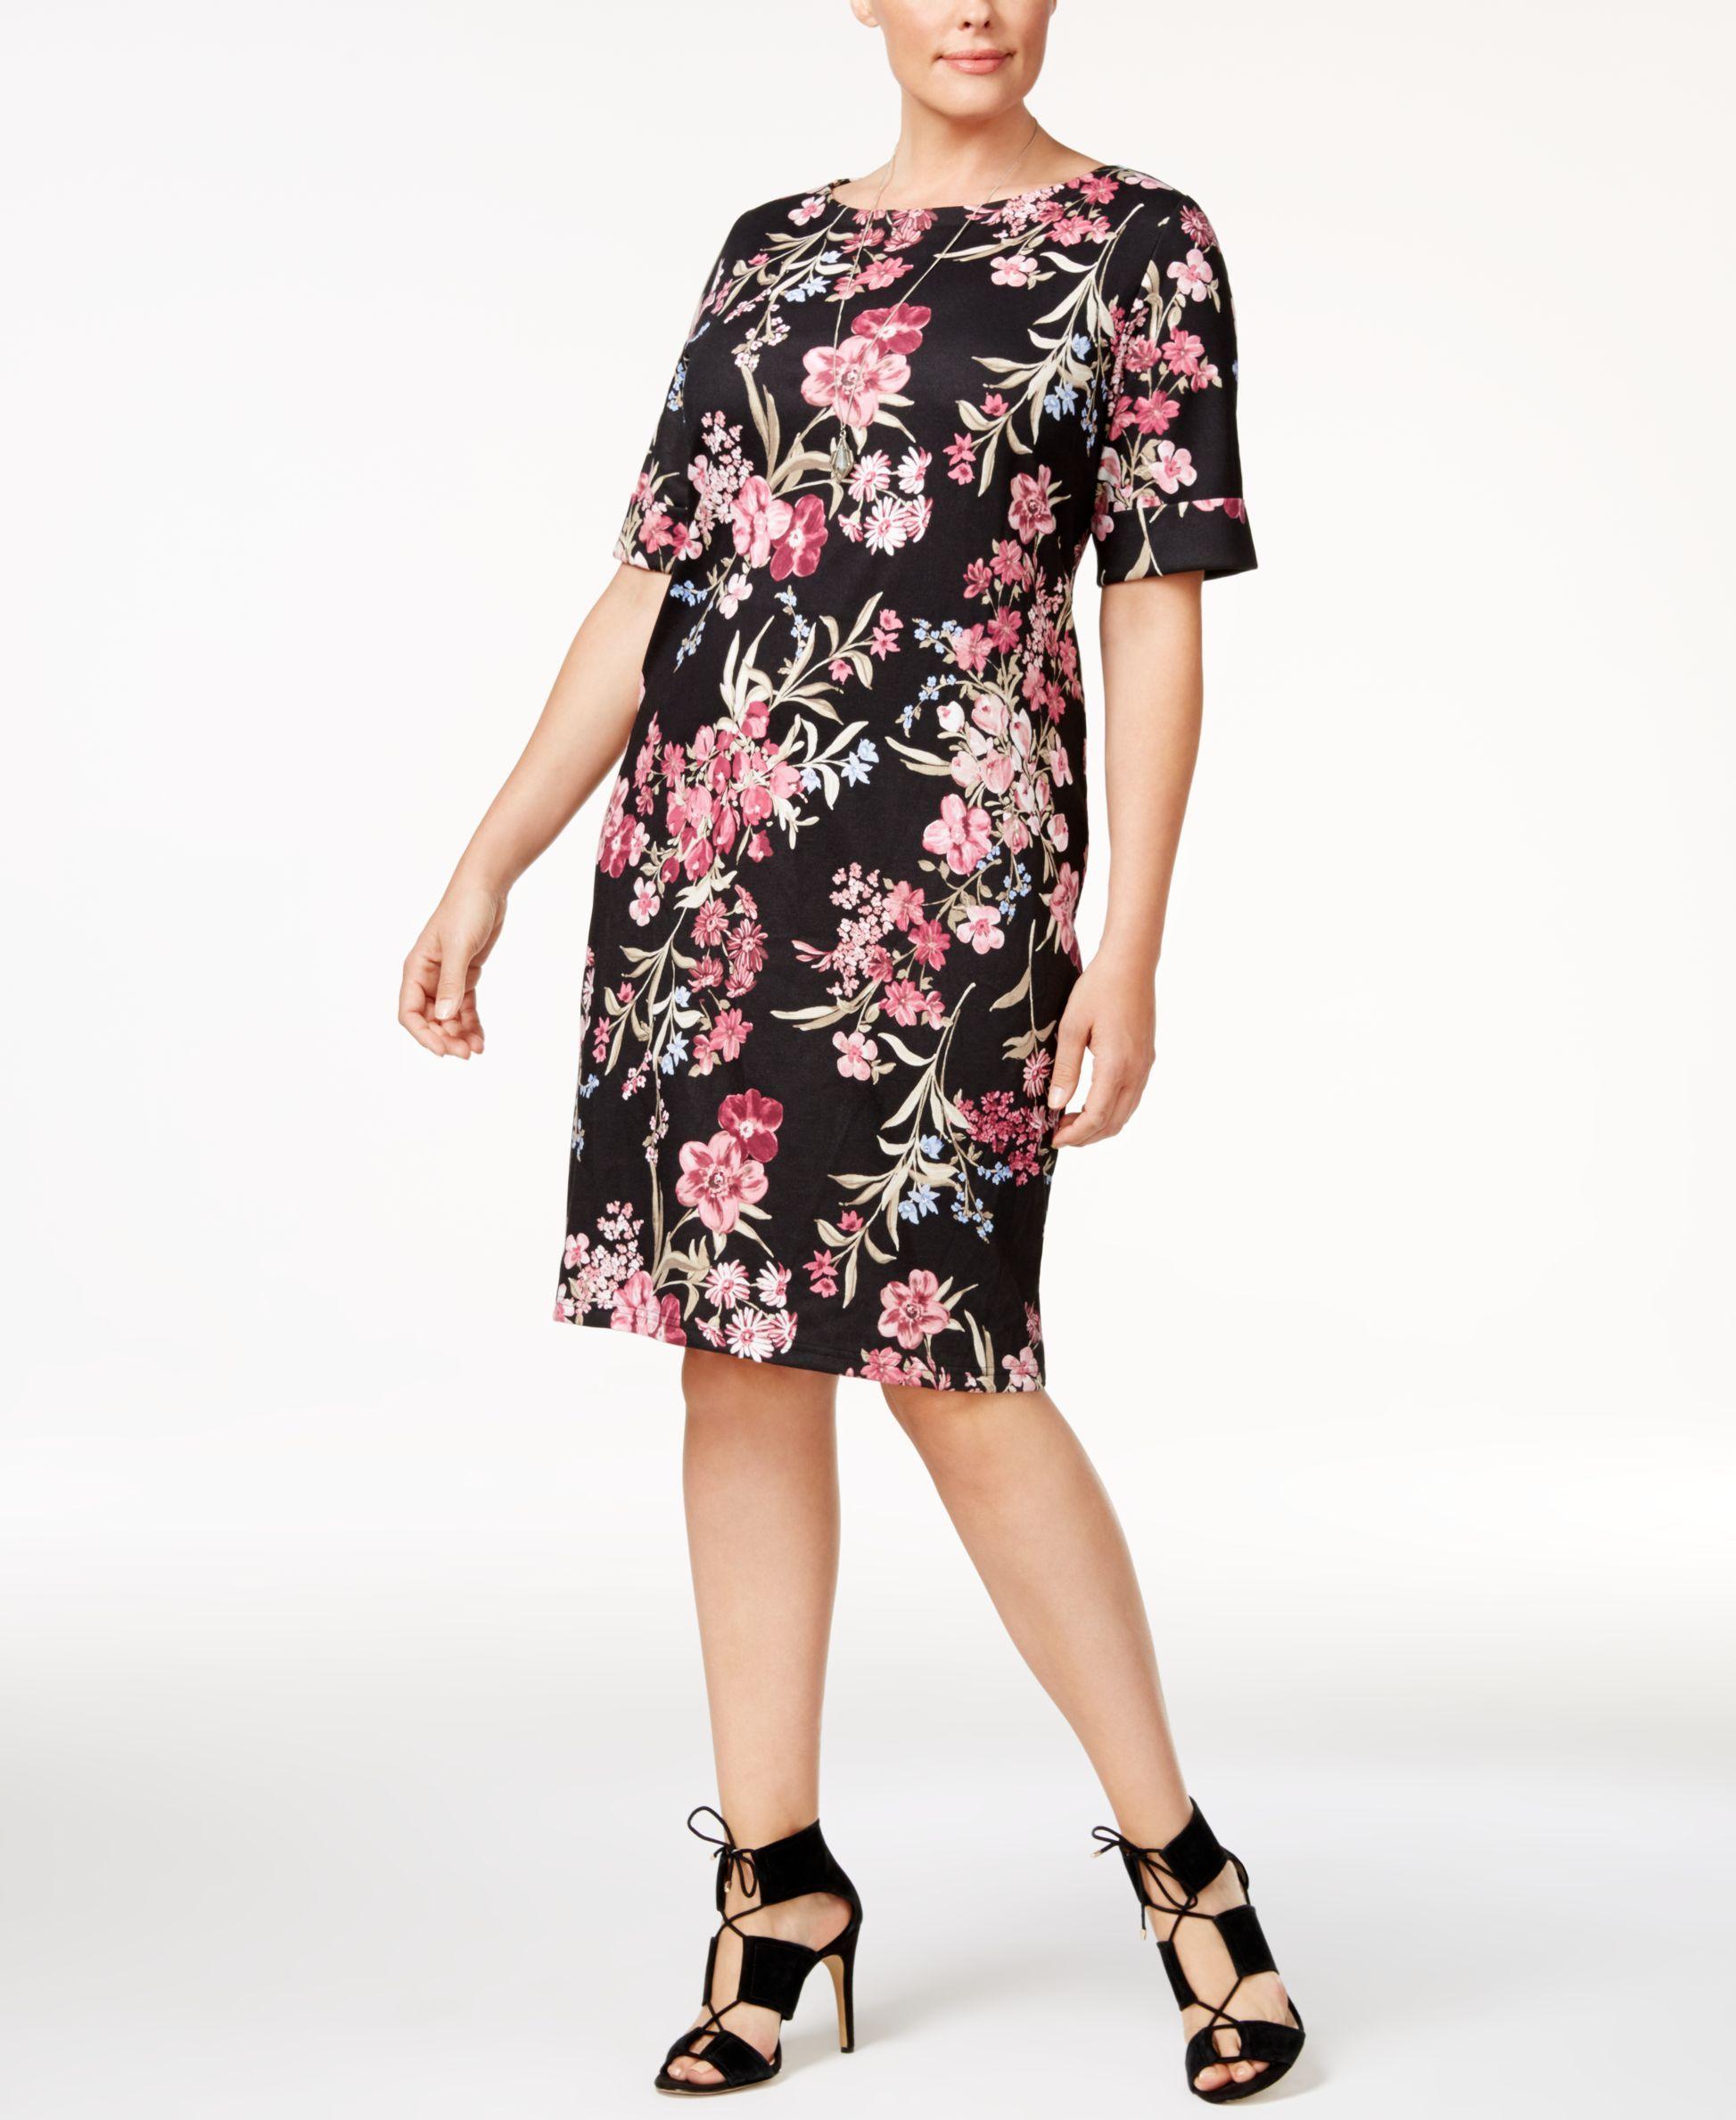 6698d6e12dc6 Karen Scott Plus Size Floral-Print Shift Dress, Only at Macy's ...